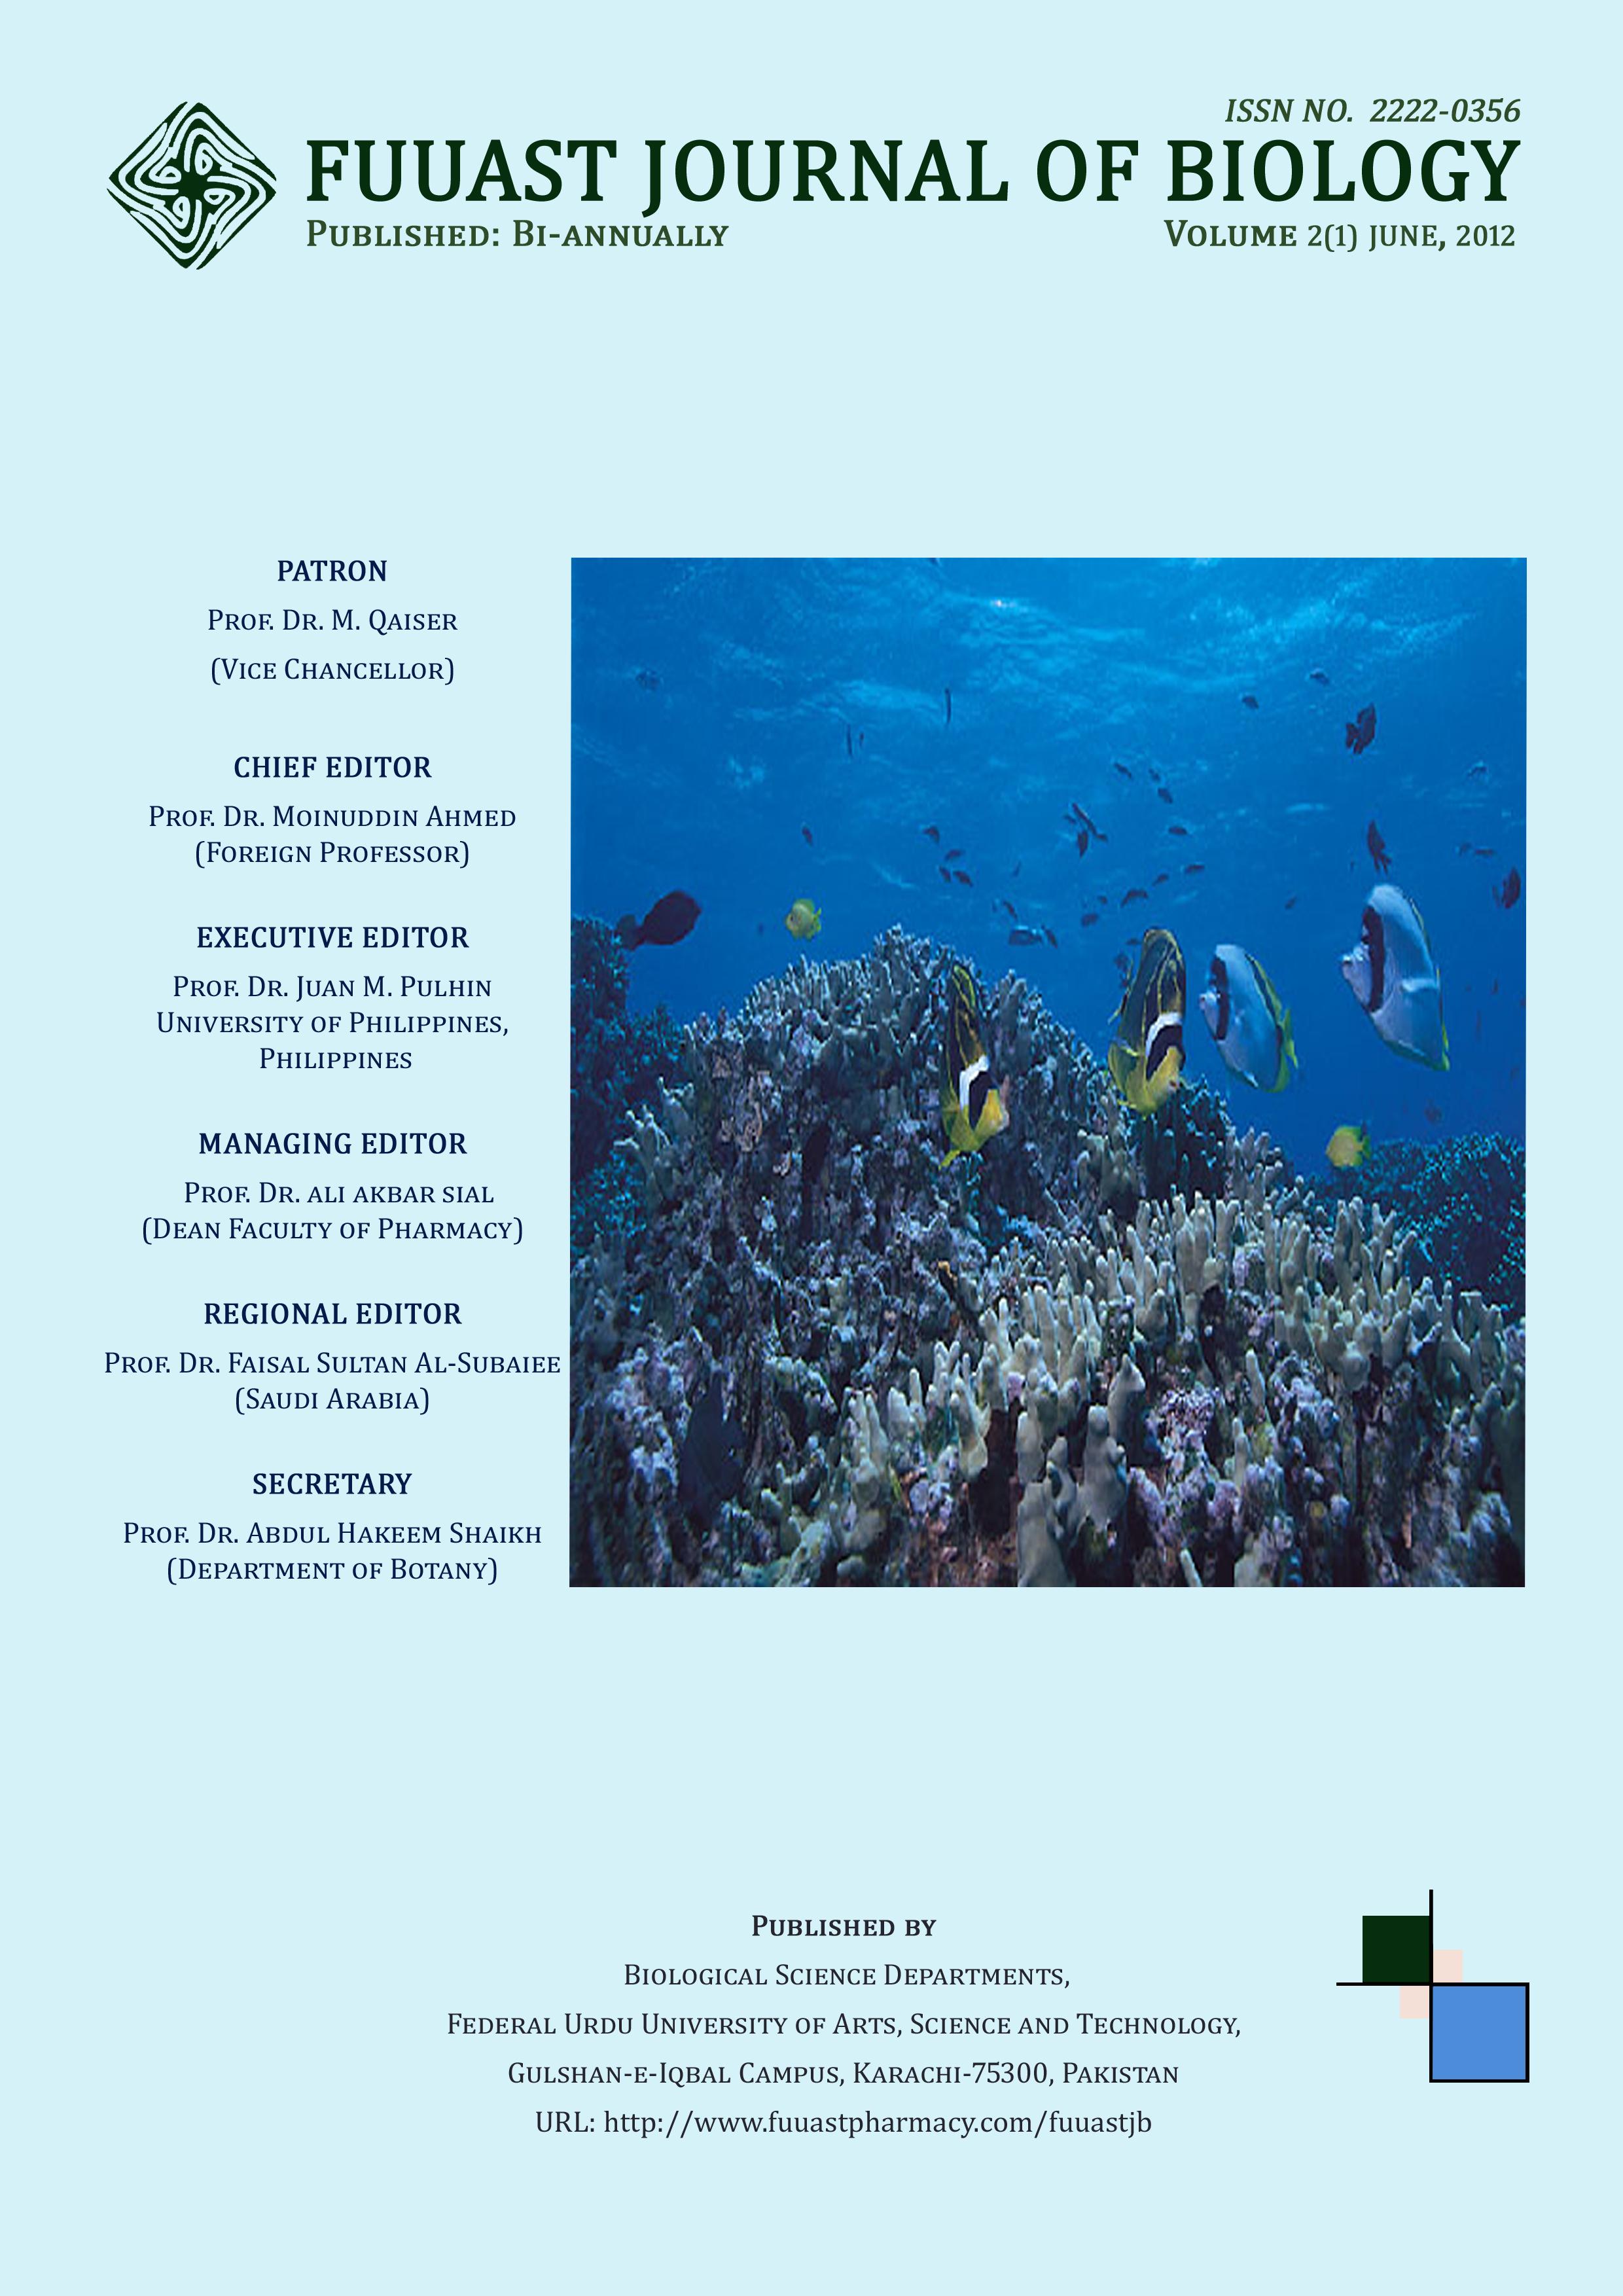 View Vol. 2 No. 1 june (2012): Fuuast Journal of Biology